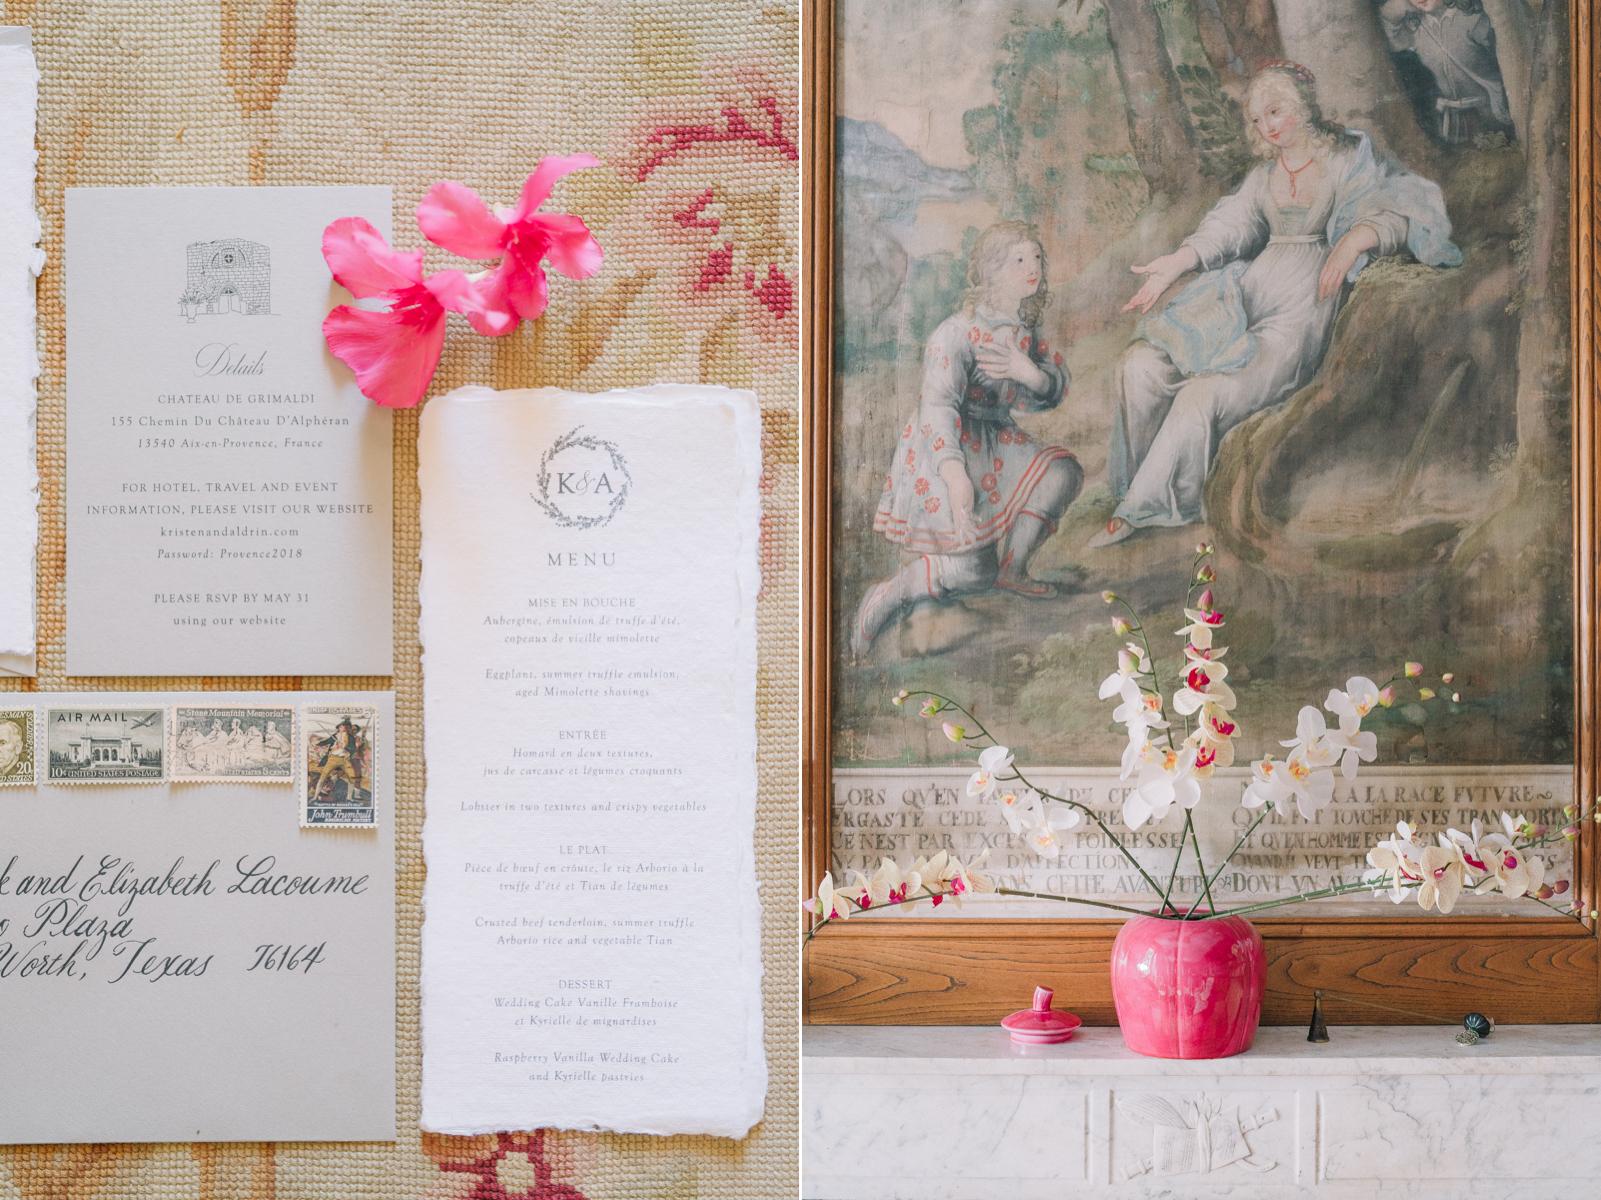 Boheme-Moon-Photography-Wedding-in-Provence-France_008.jpg